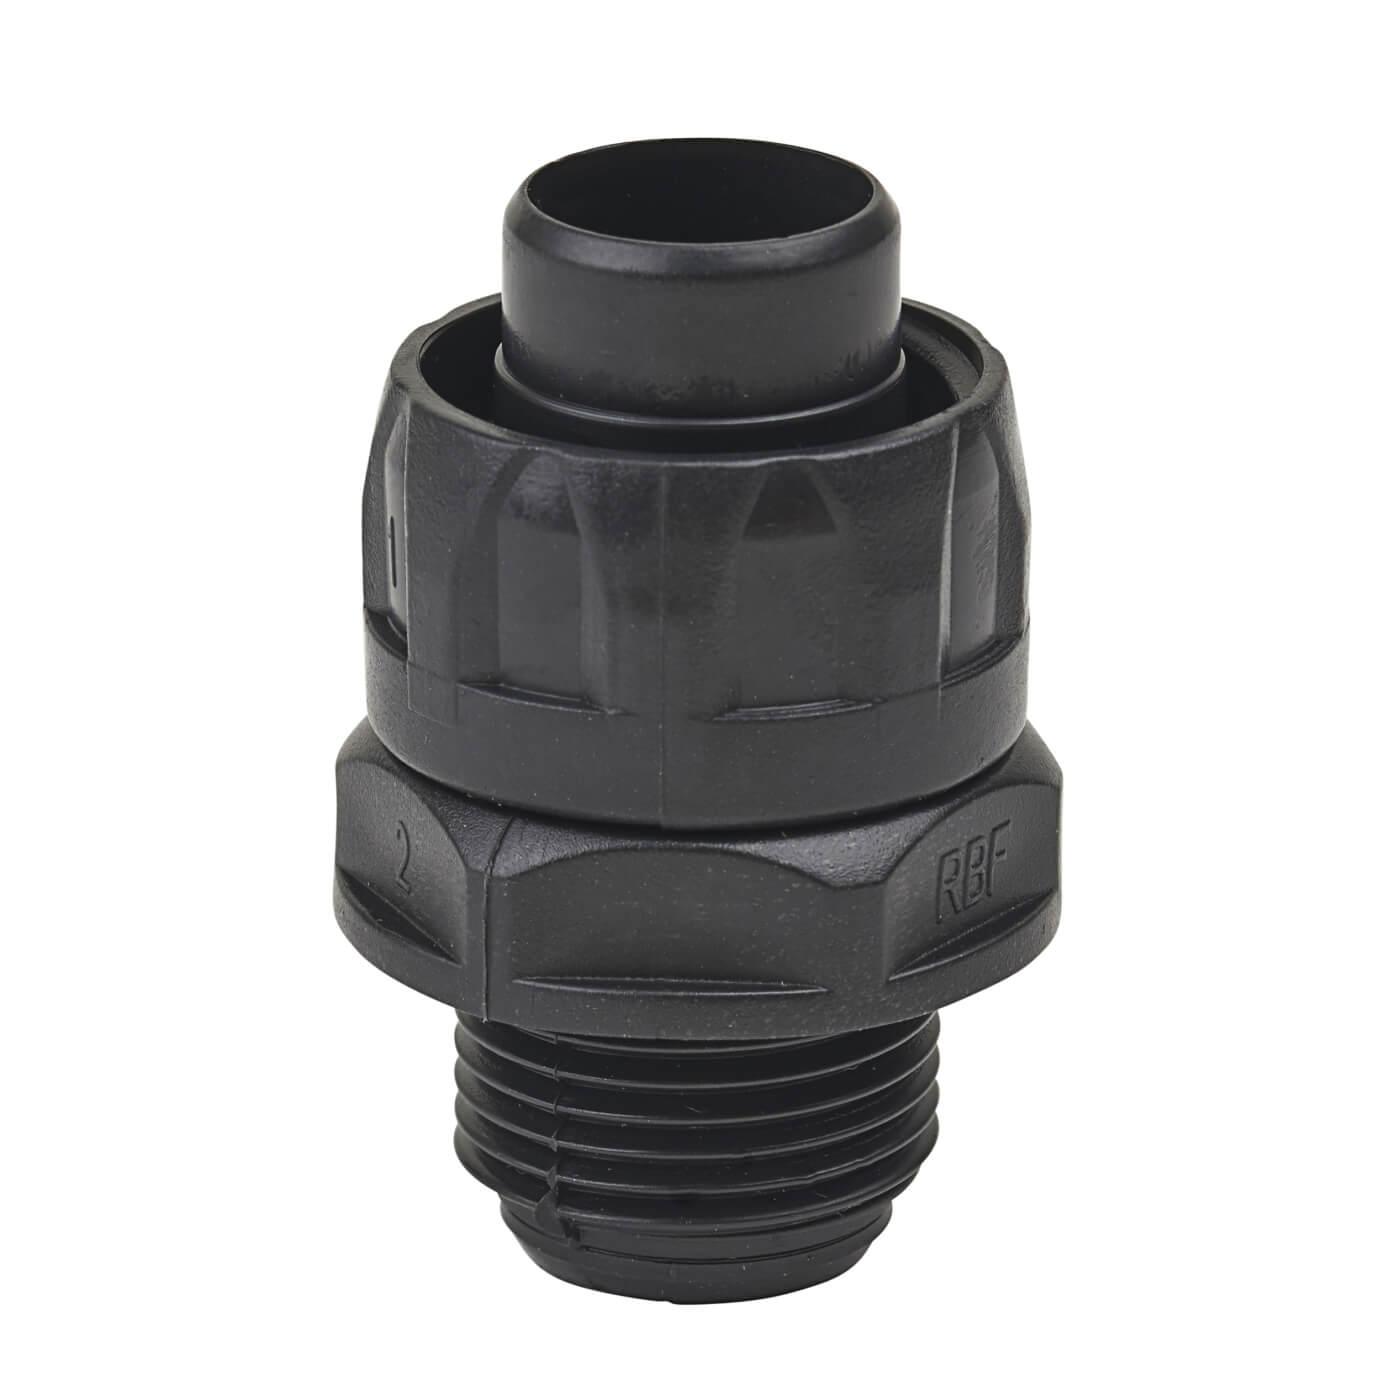 Ronbar Flexible Conduit Gland 20mm Electricaldirect